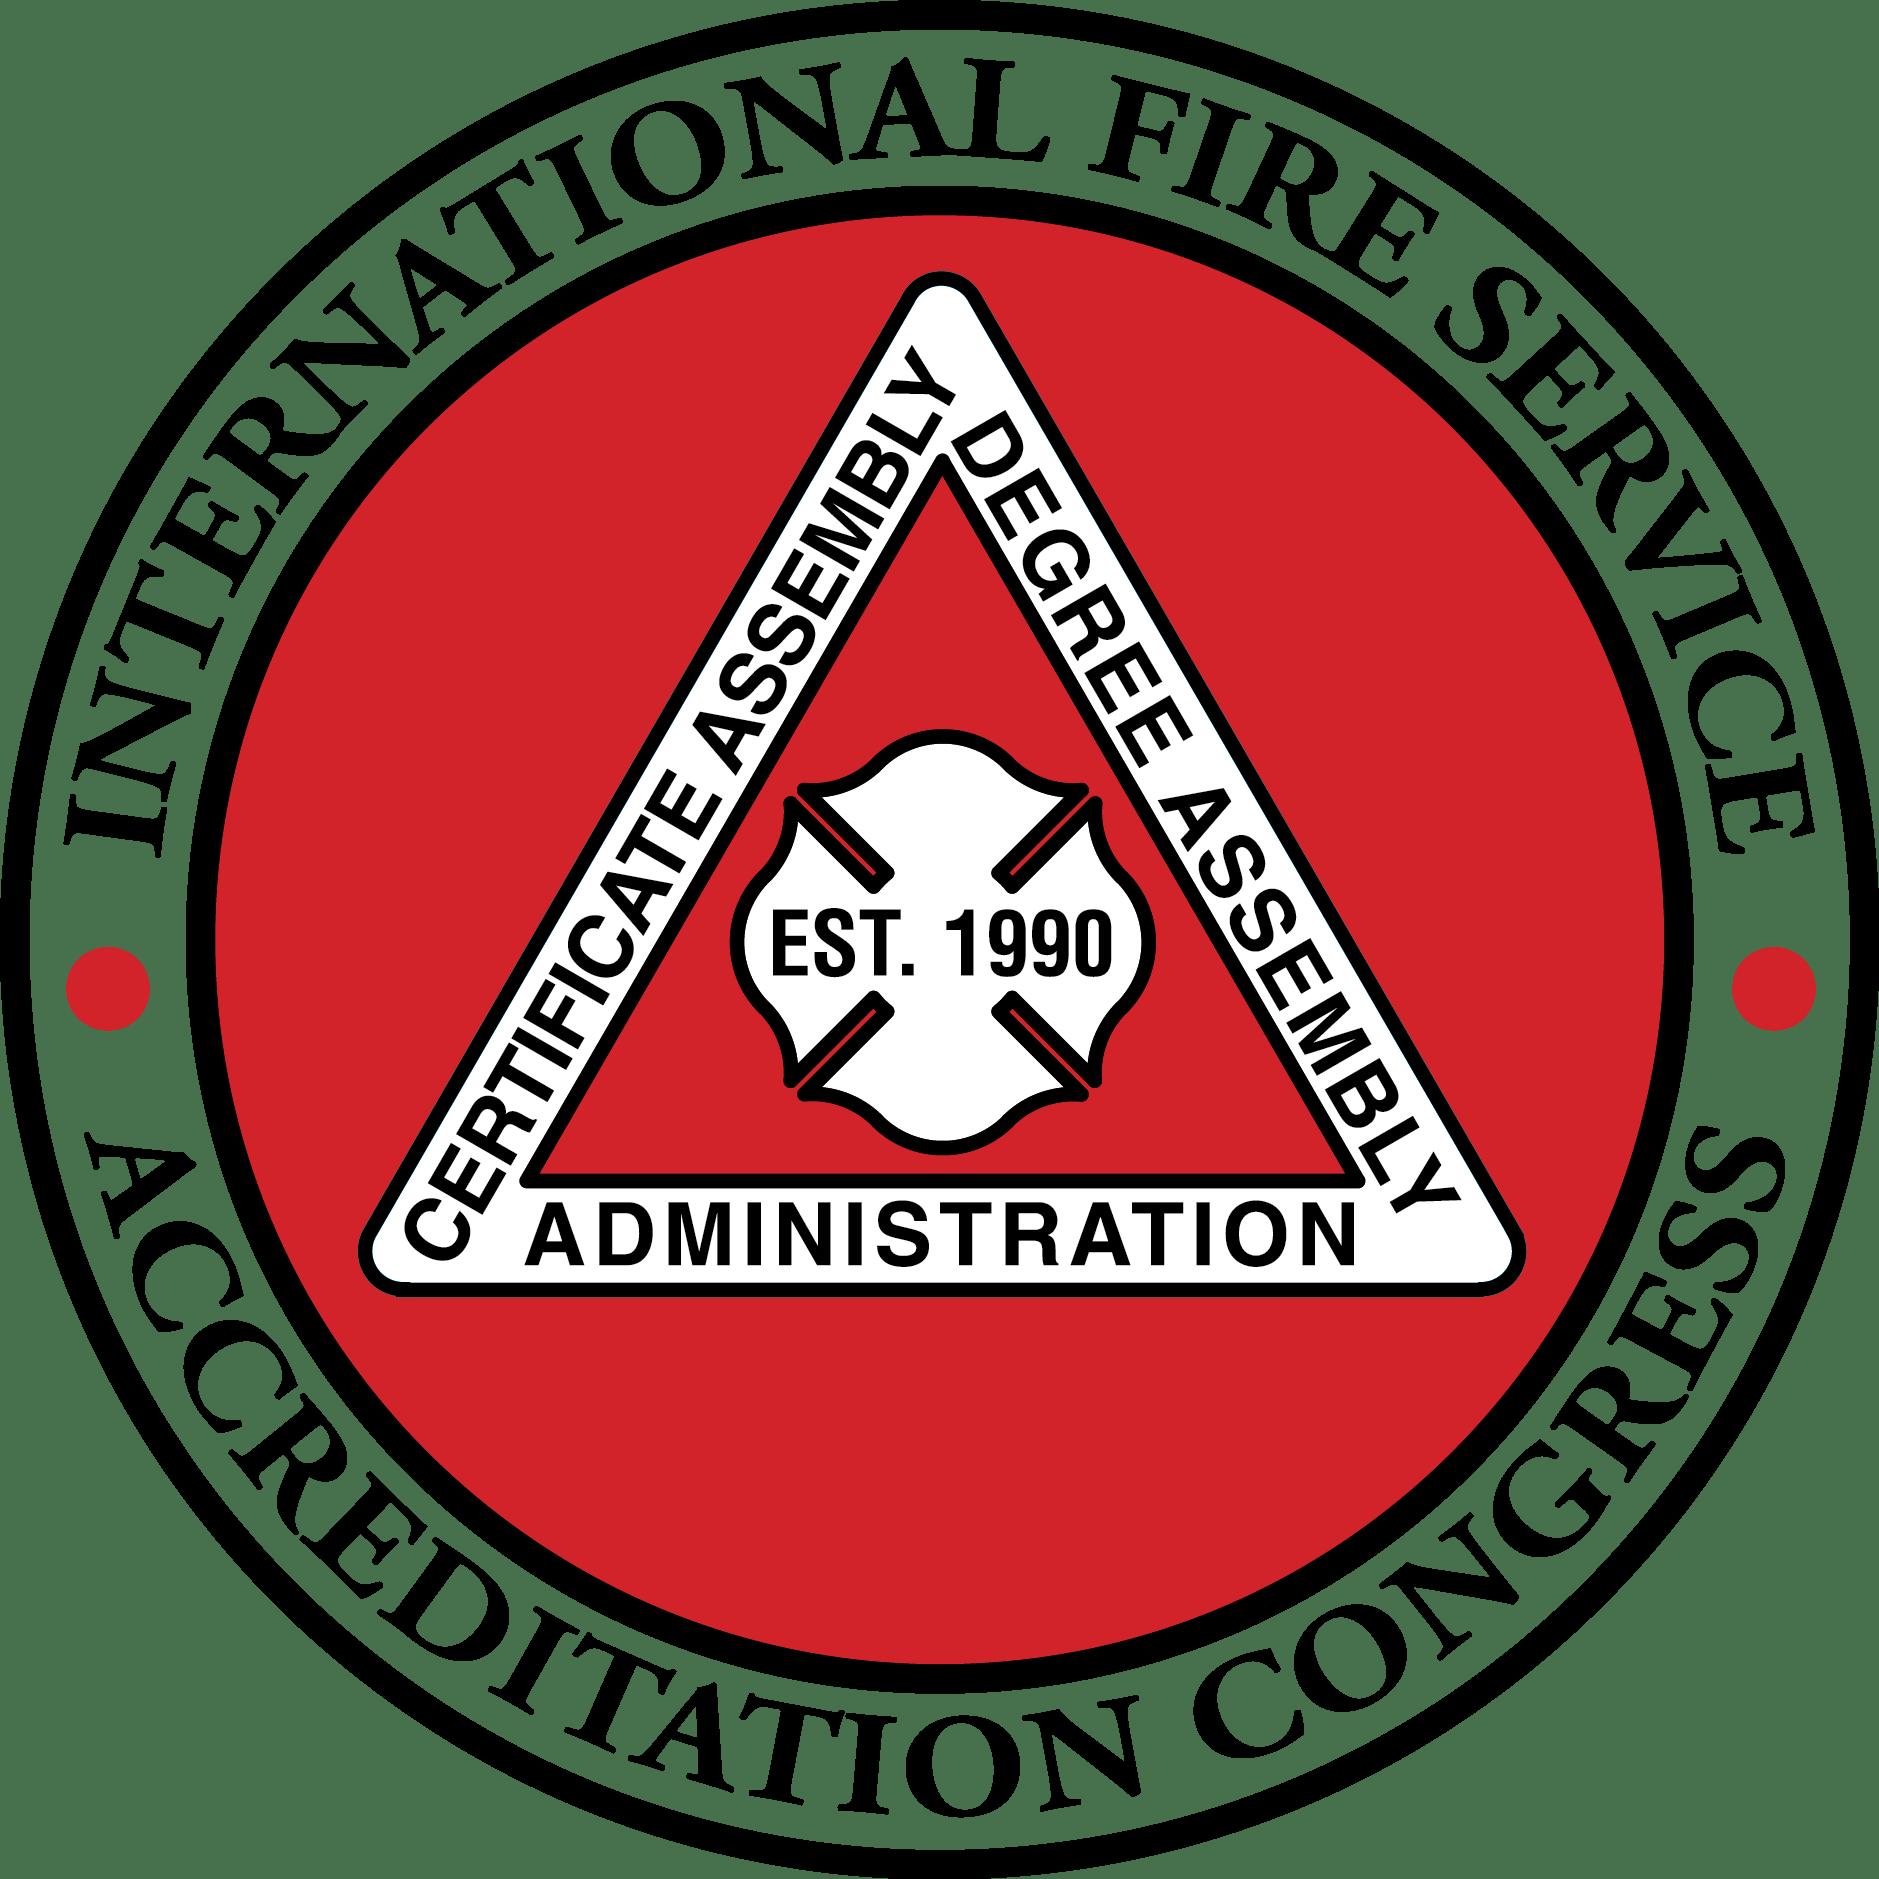 International Fire Service Accreditation Council